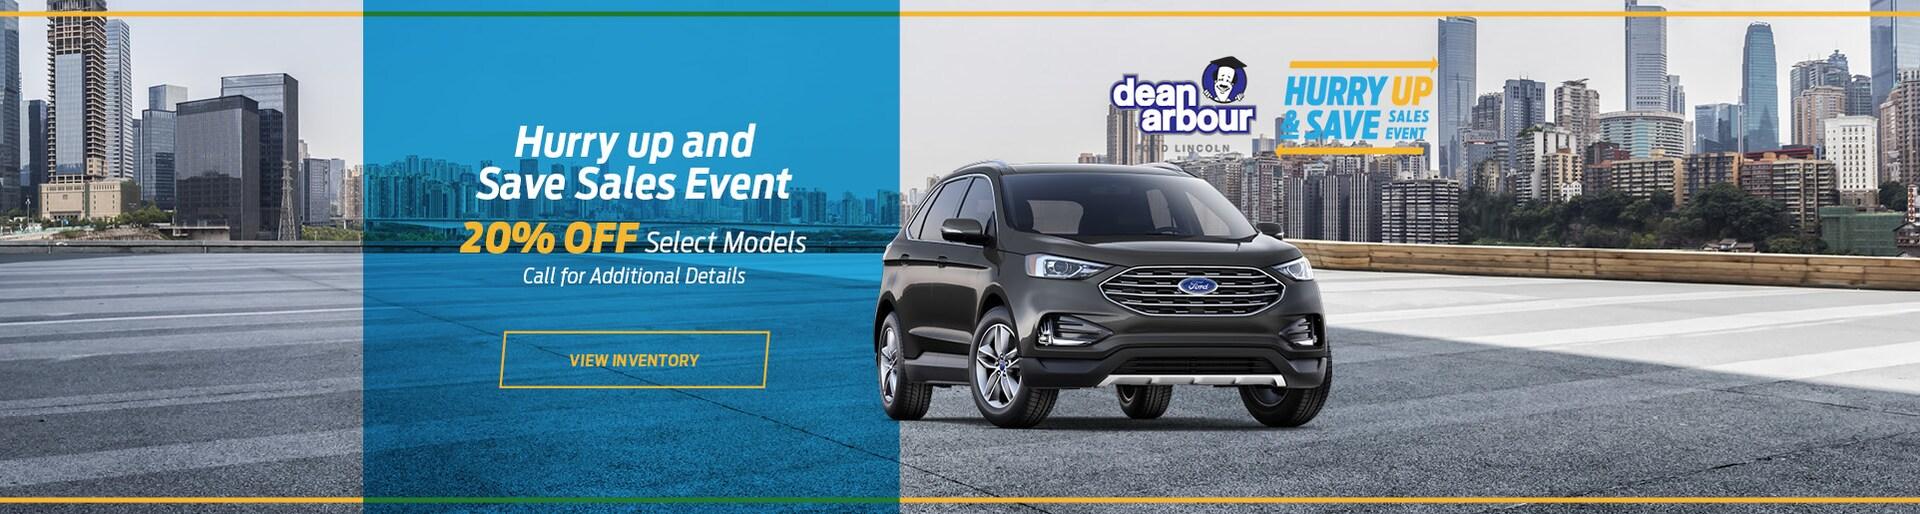 Dean Arbour Ford >> Dean Arbour Ford Lincoln New Used Car Dealer Alpena Mi